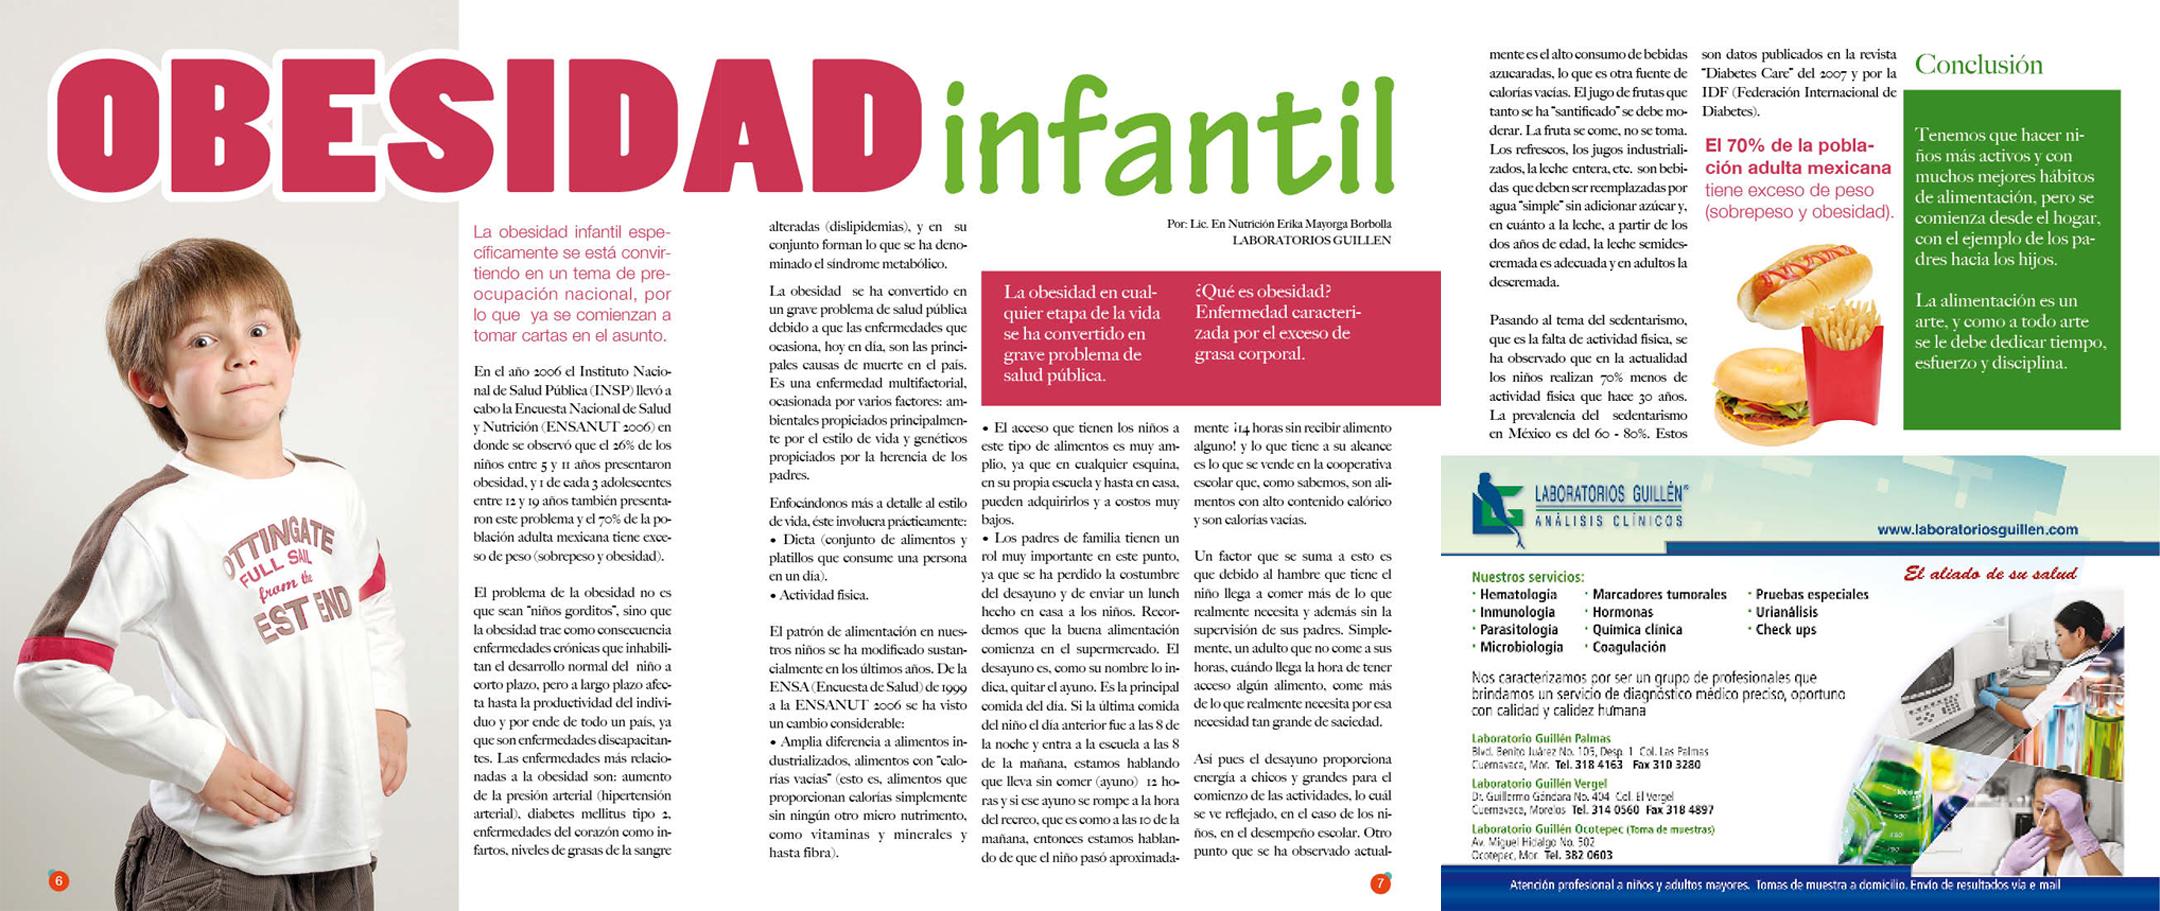 Obesidad Infantil | Tu Salud Cuernavaca